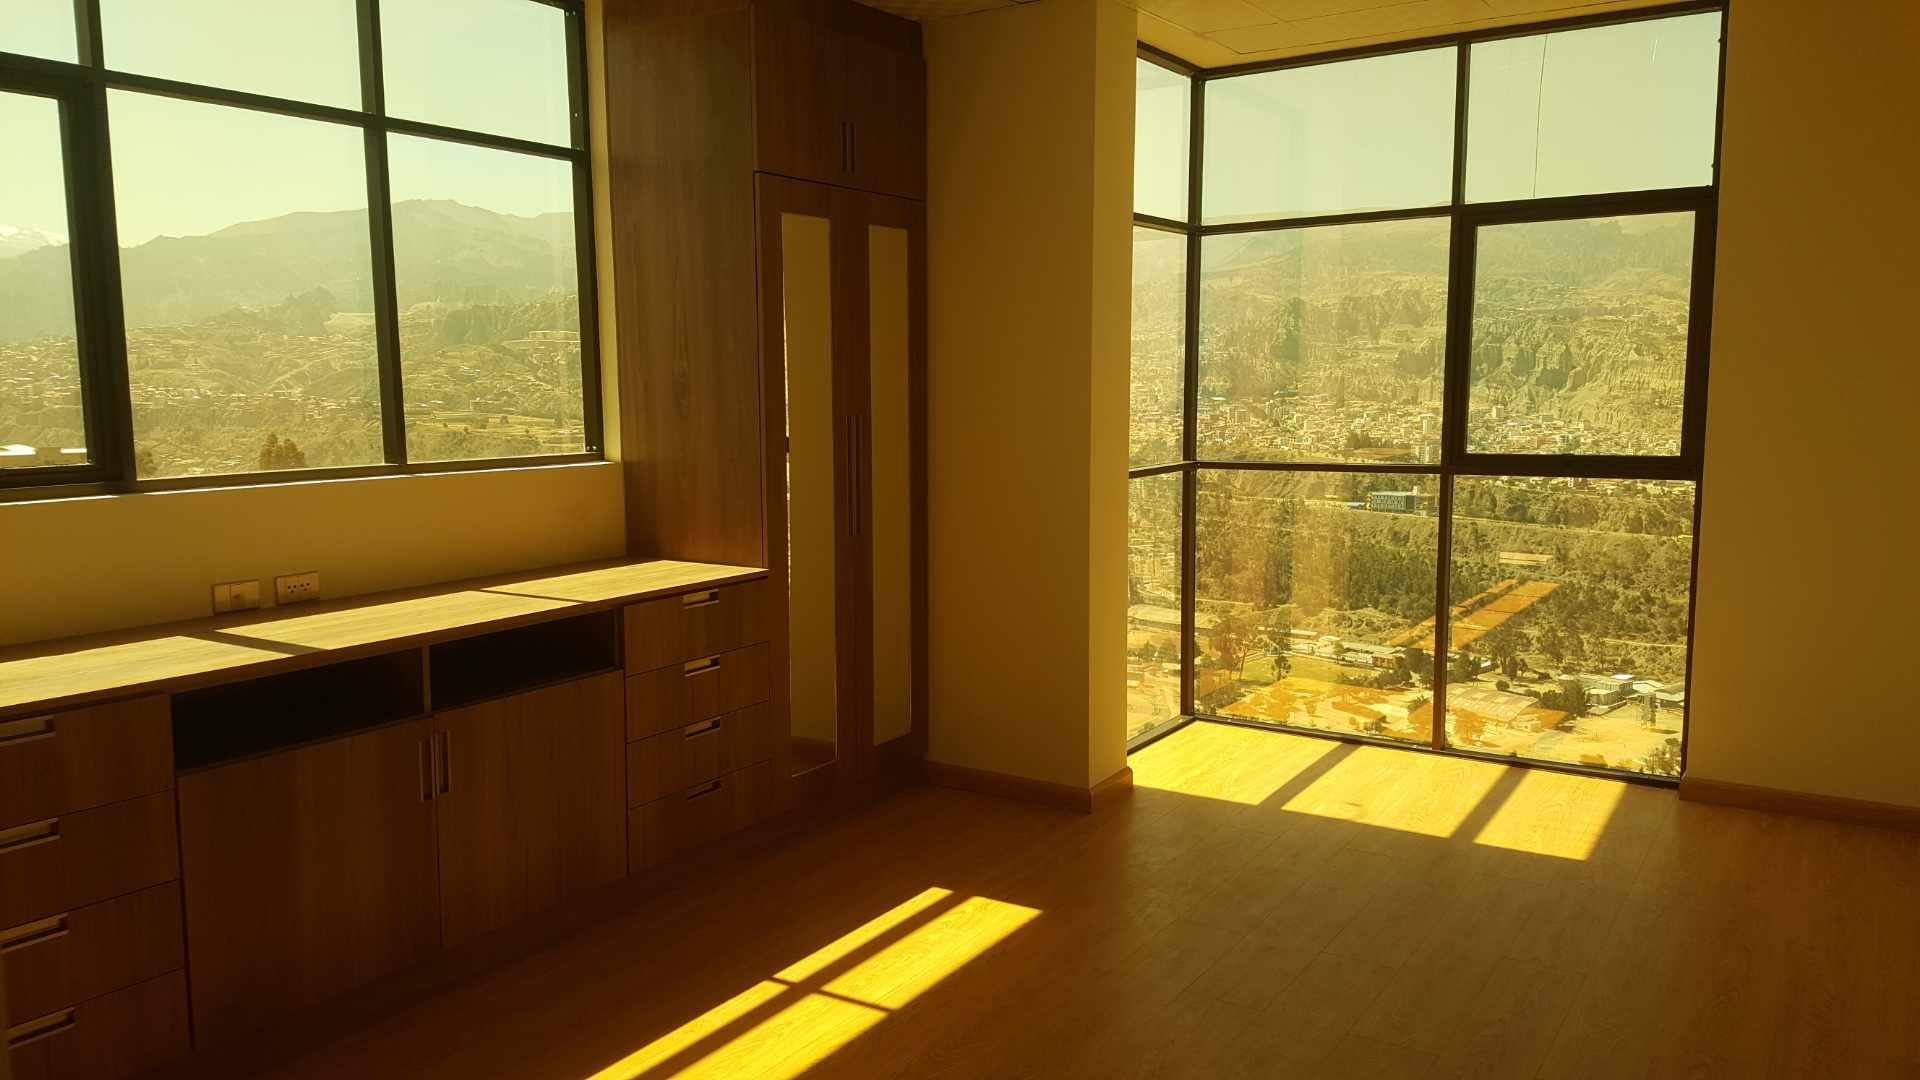 Departamento en Alquiler Edif. Taborga II. Urb. San Alberto.    Foto 6